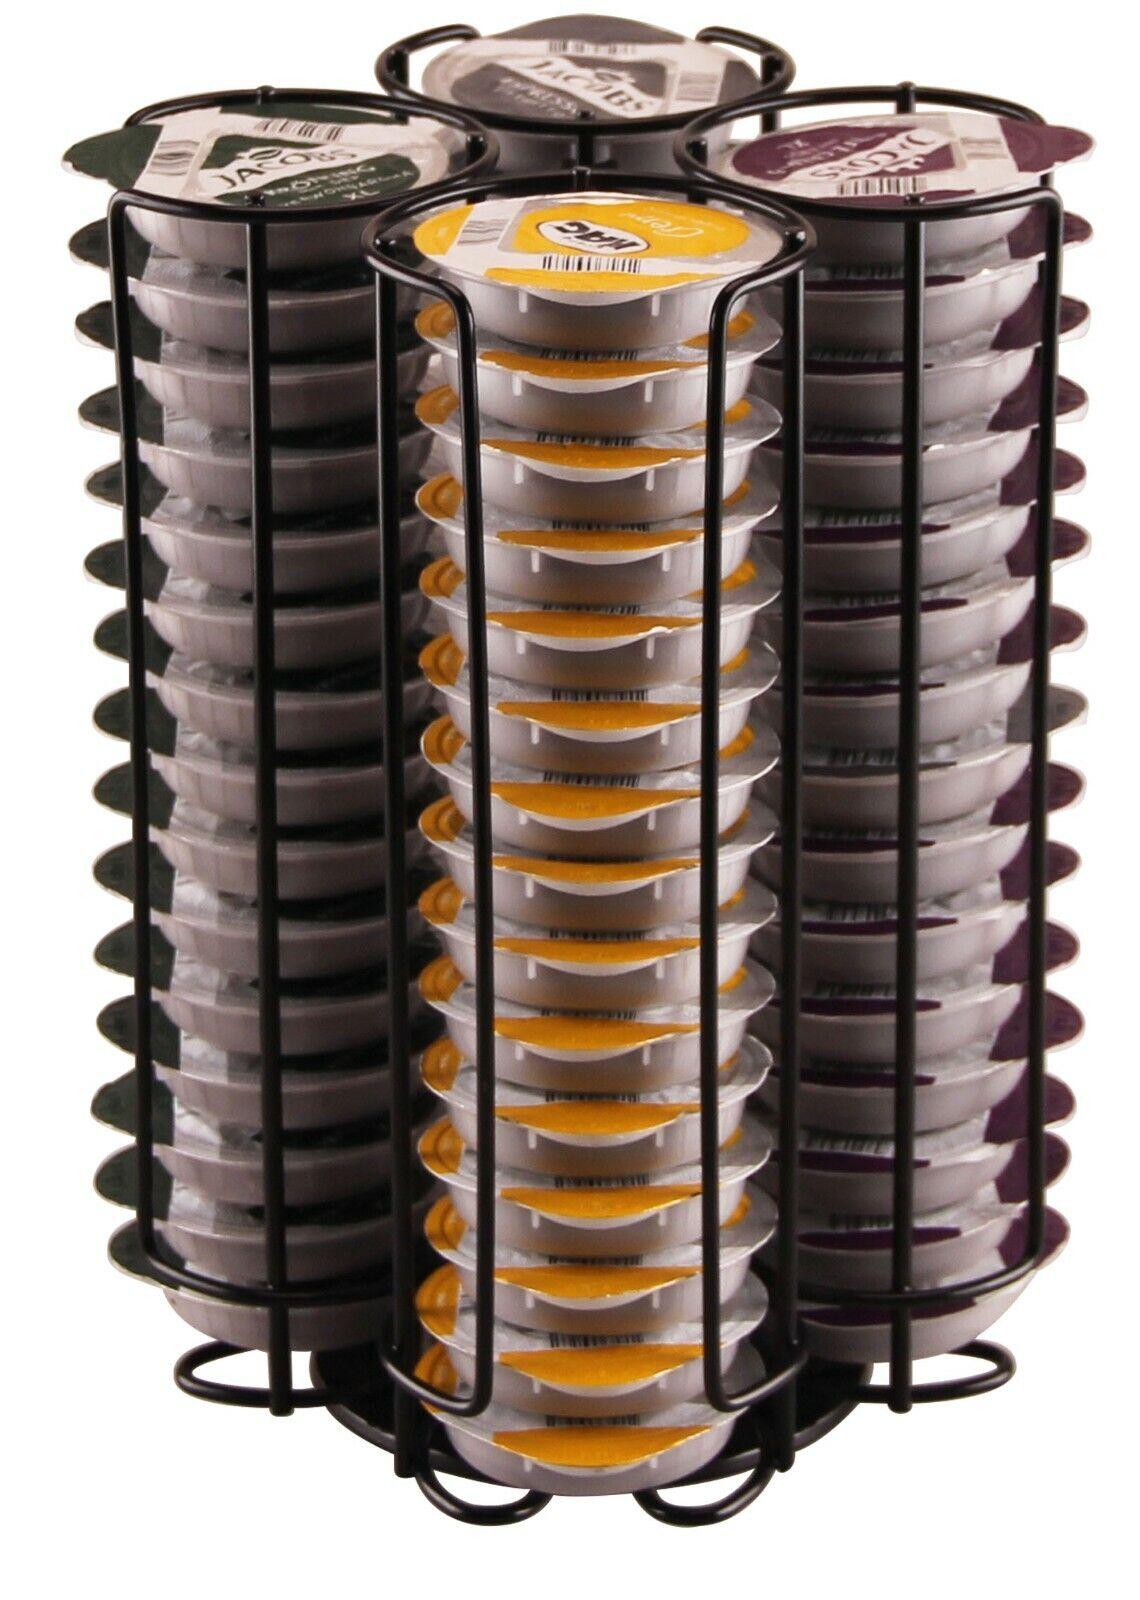 Taylor /& Brown/® Tassimo 52 Coffee Pod T-Disc Capsule Holder Dispenser